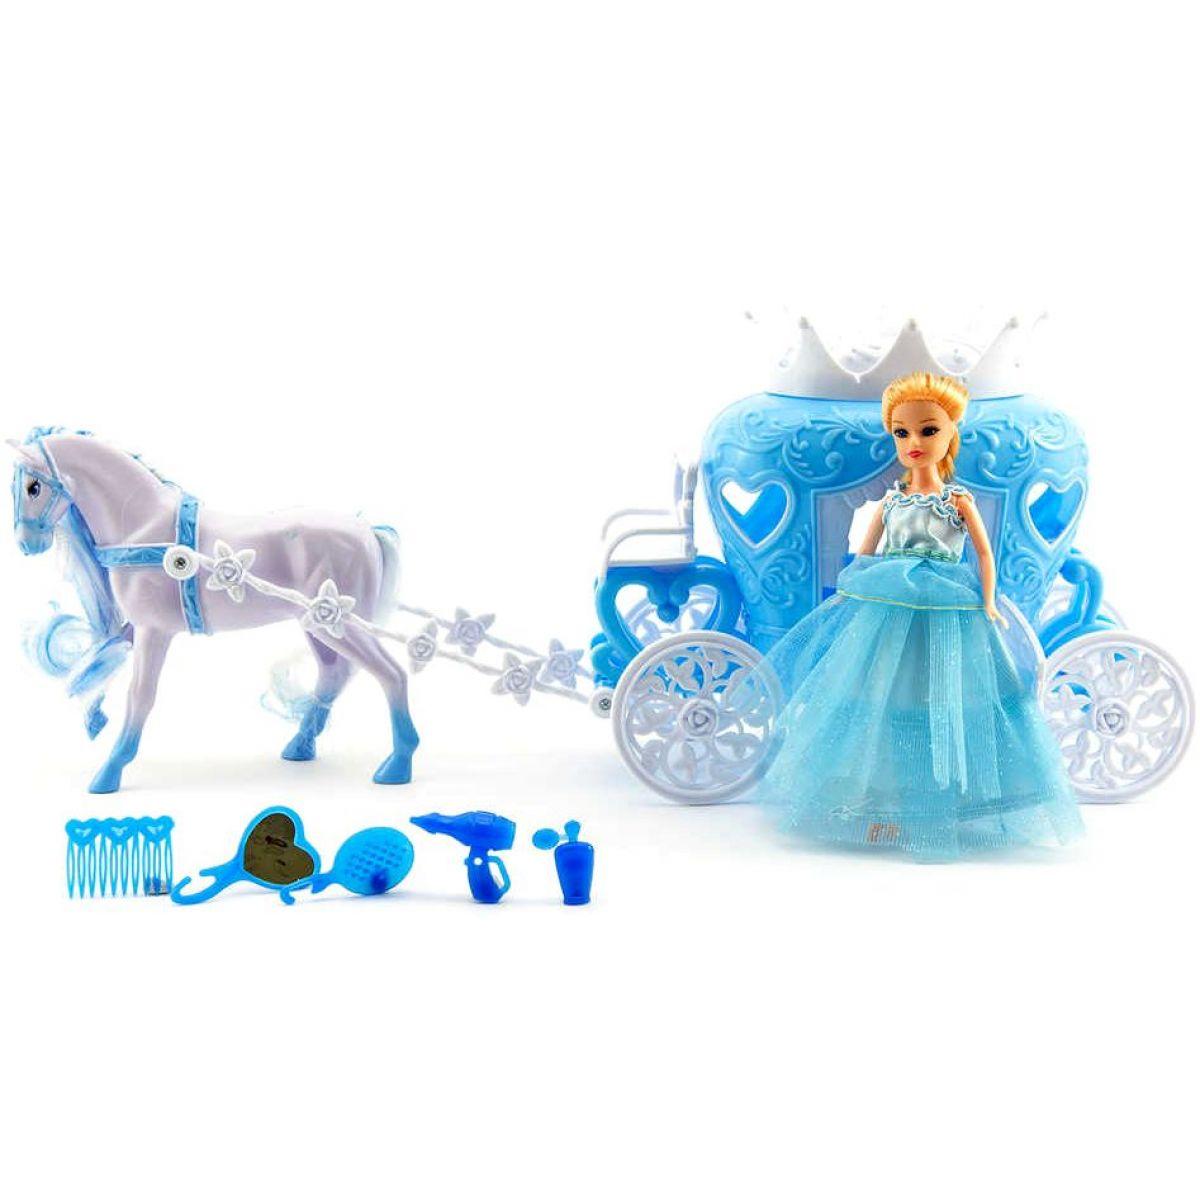 Teddies T00541901 Kůň s kočárem + doplňky plast 40cm